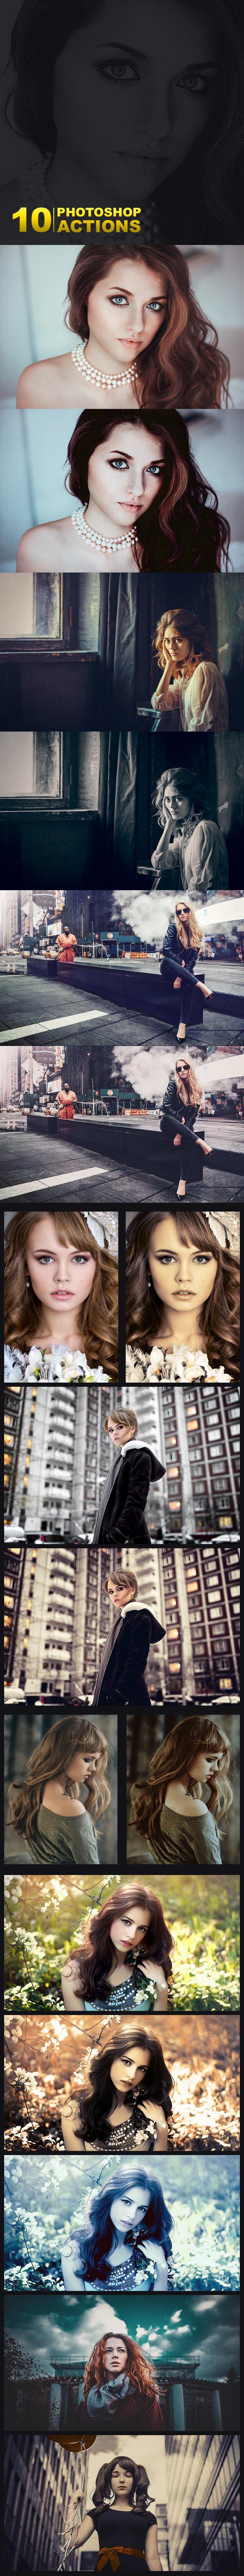 10 Premium Photoshop Actions Set - Photo Effects Actions